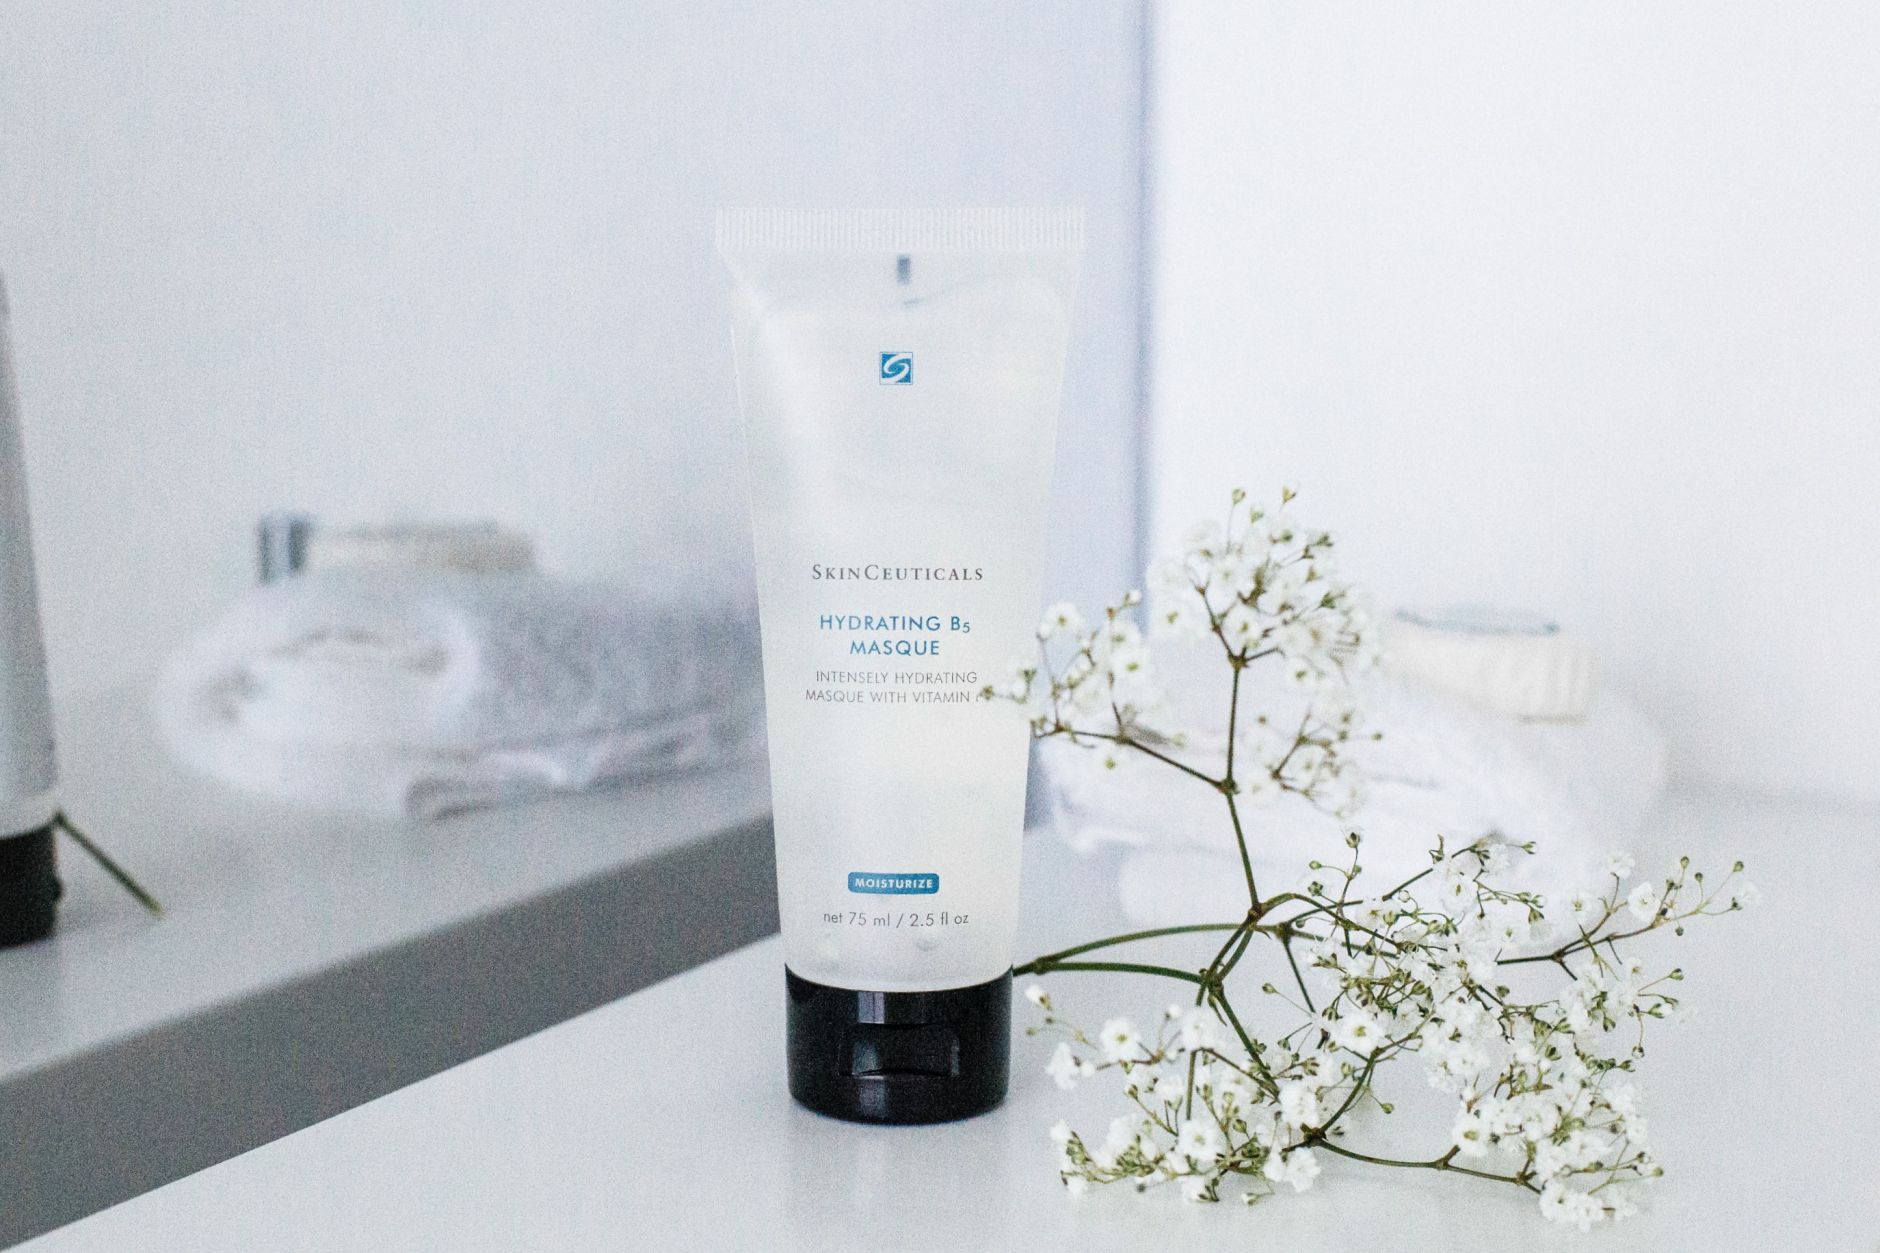 SkinCeuticals-Hydratimg-B5-Masque-02